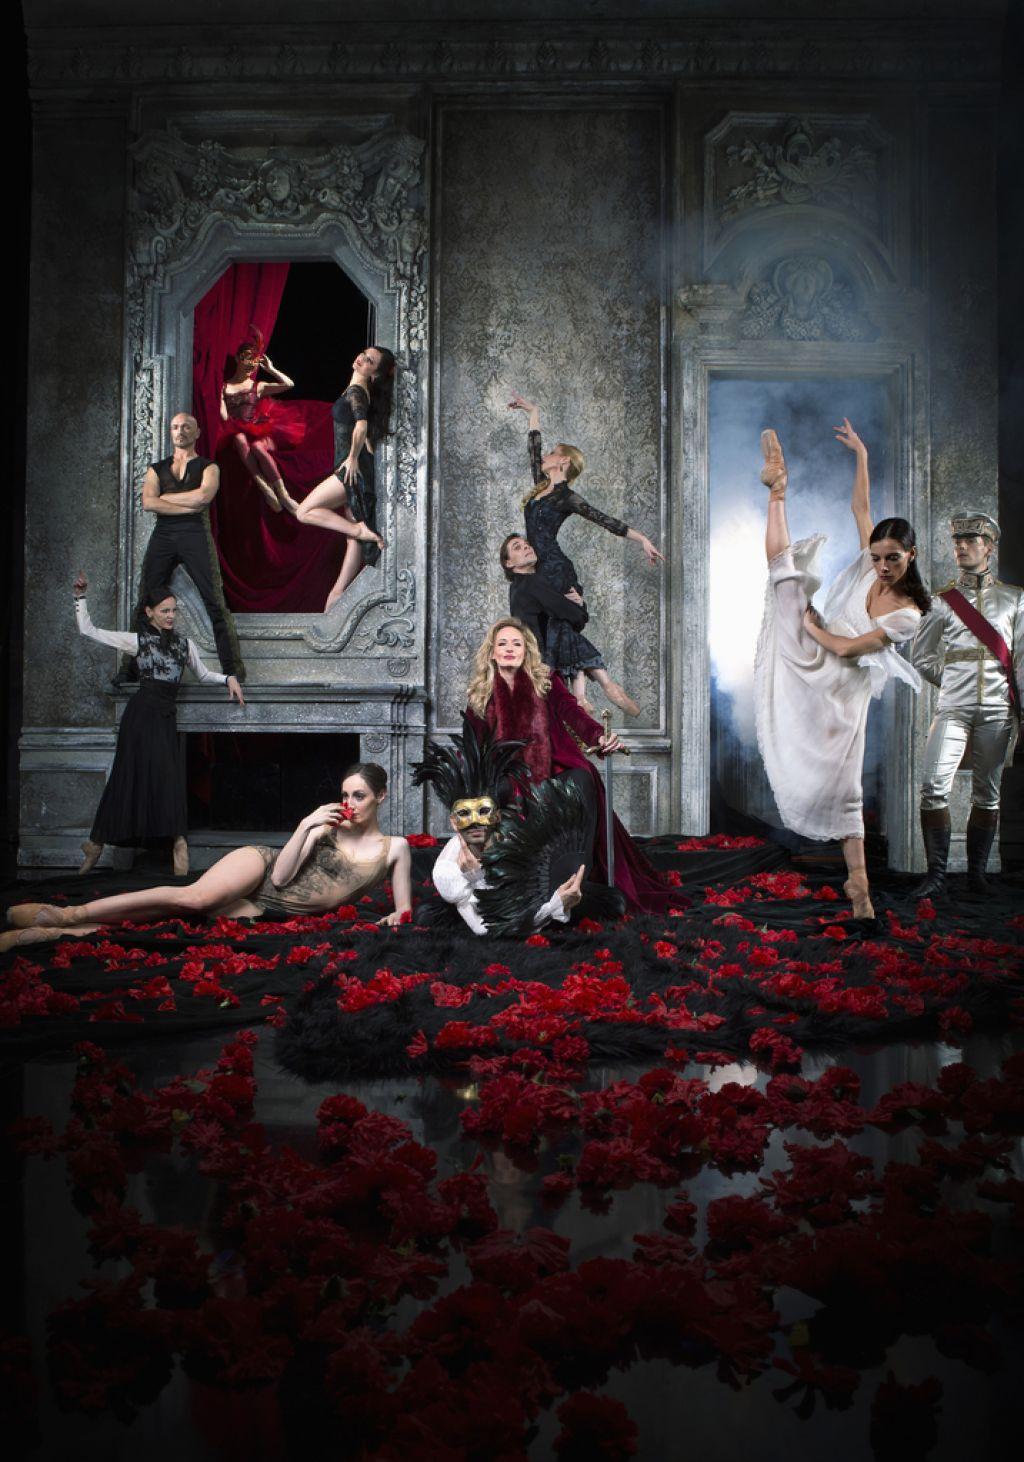 Deloskop izpostavlja: Valentina za valentinovo